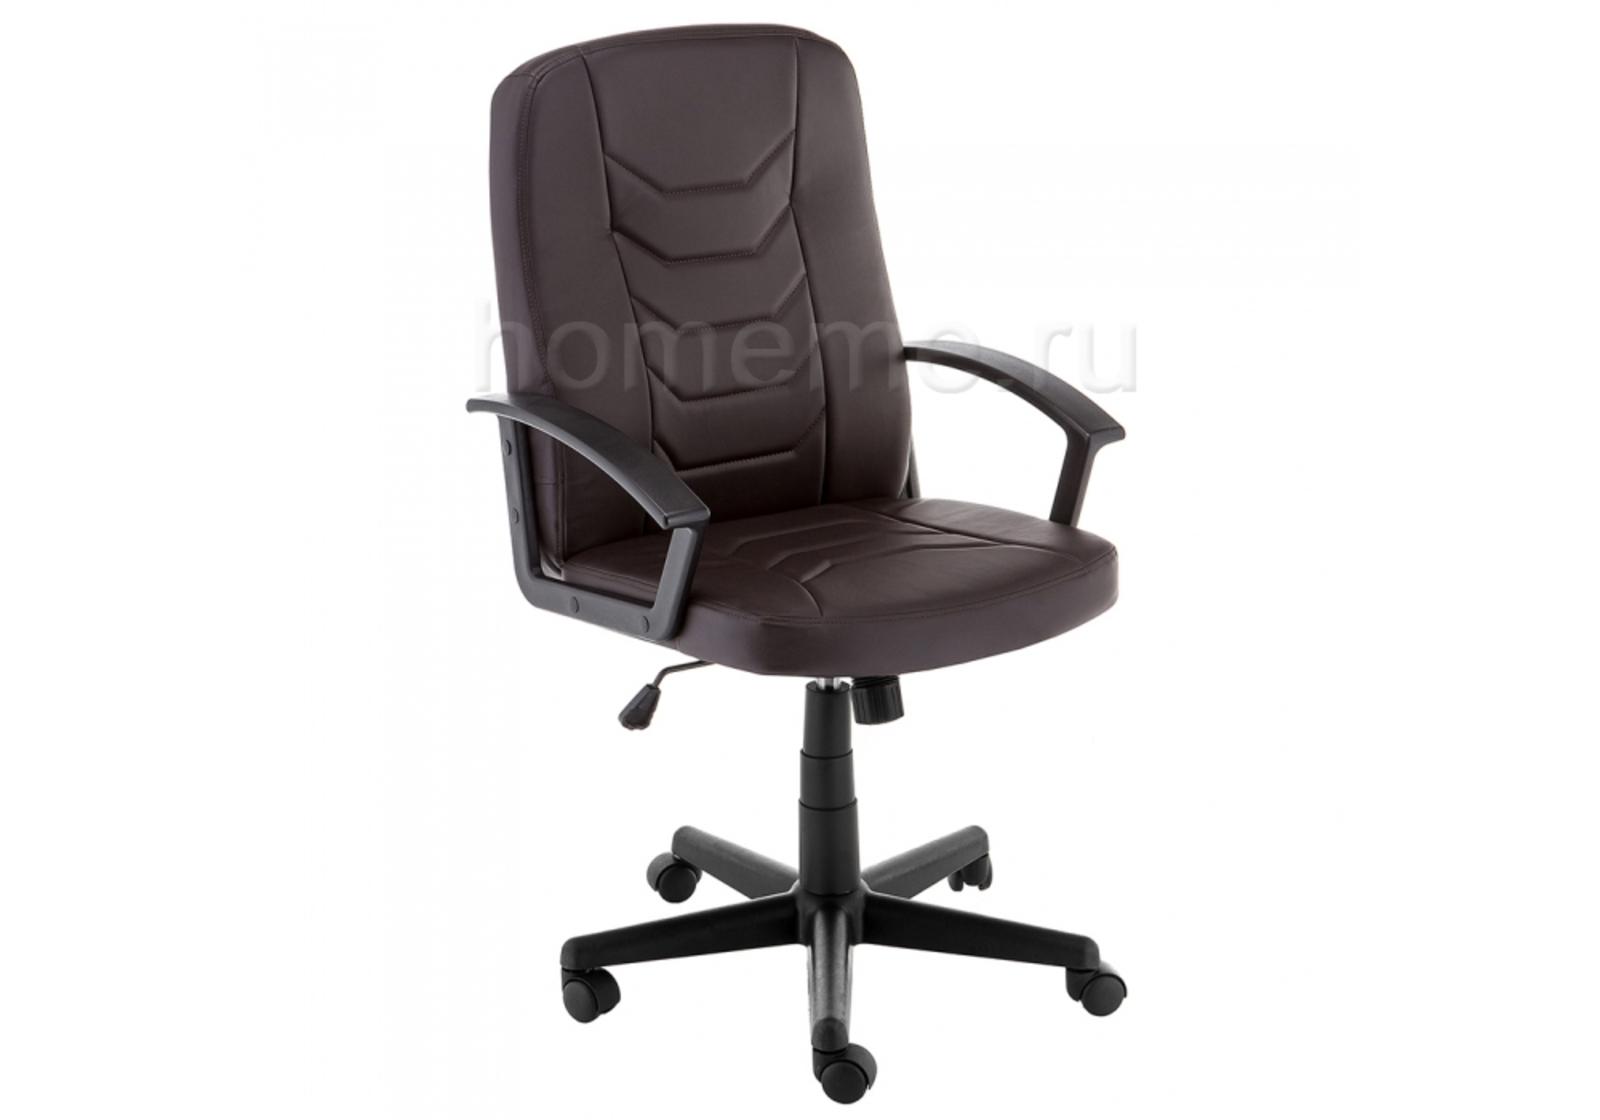 Кресло для офиса HomeMe Darin коричневое 11268 от Homeme.ru